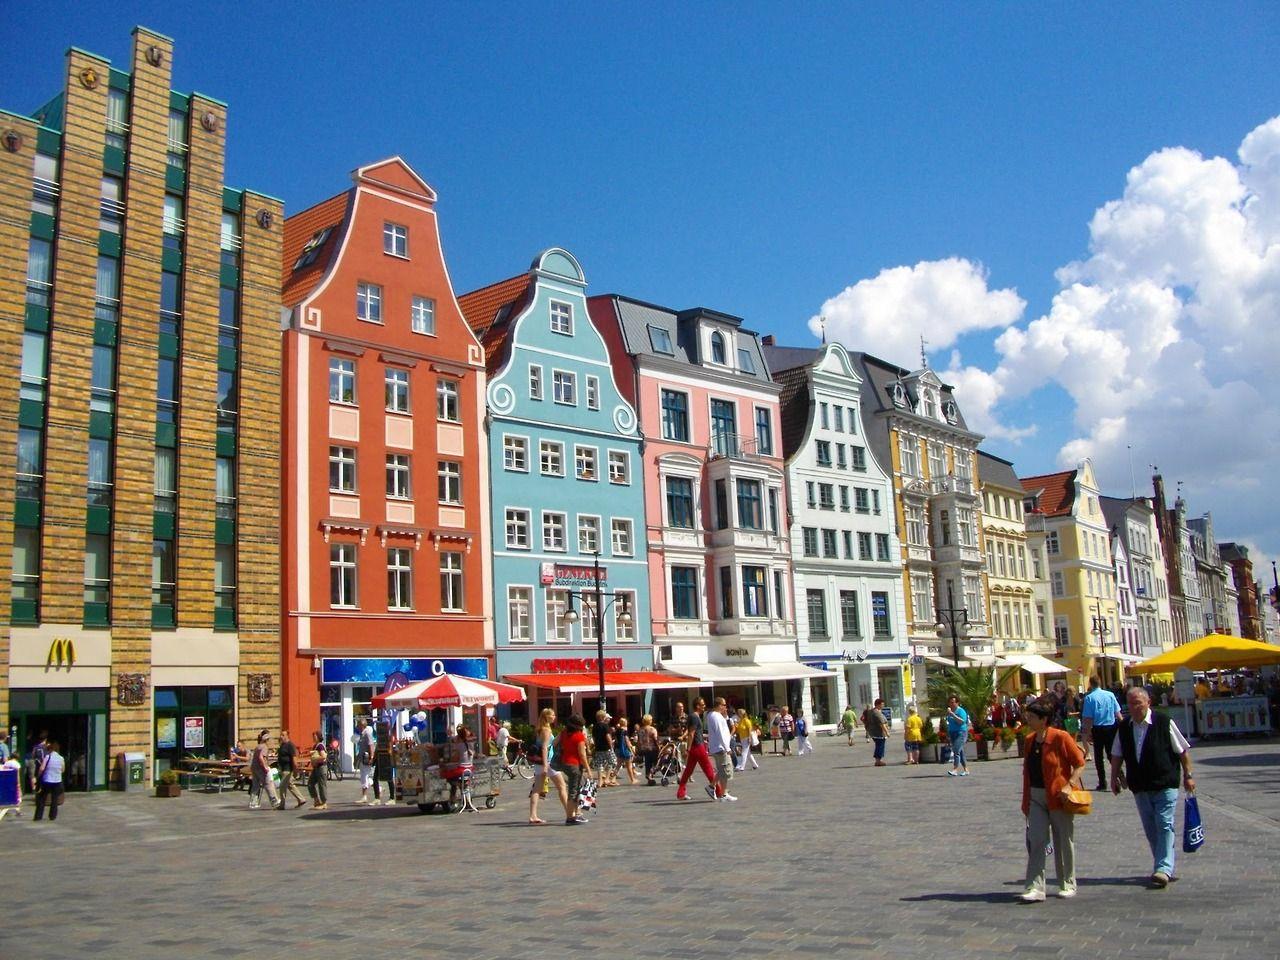 #Rostock, Mecklenburg-Vorpommern, Northeastern Germany http://www.rostock.de/en/tourism/